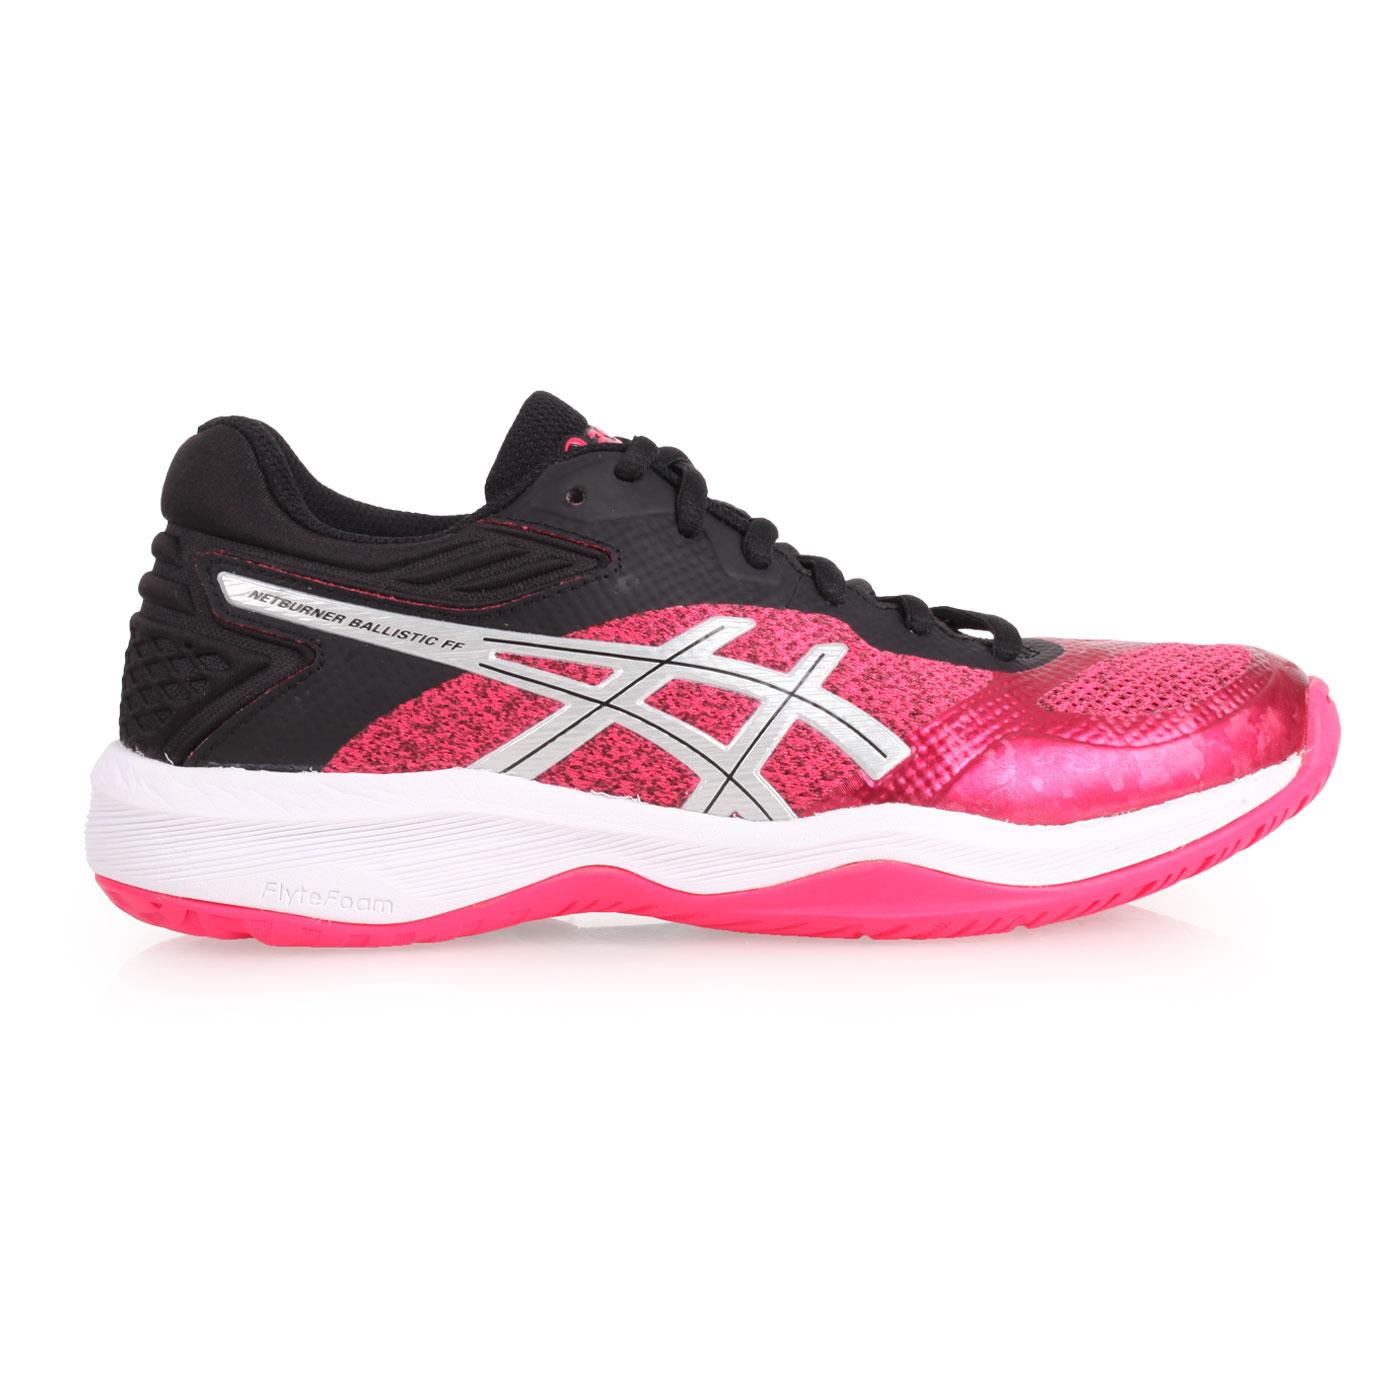 ASICS 女款排羽球鞋  @NETBURNER BALLISTIC@1052A002-100 - 桃紅黑銀